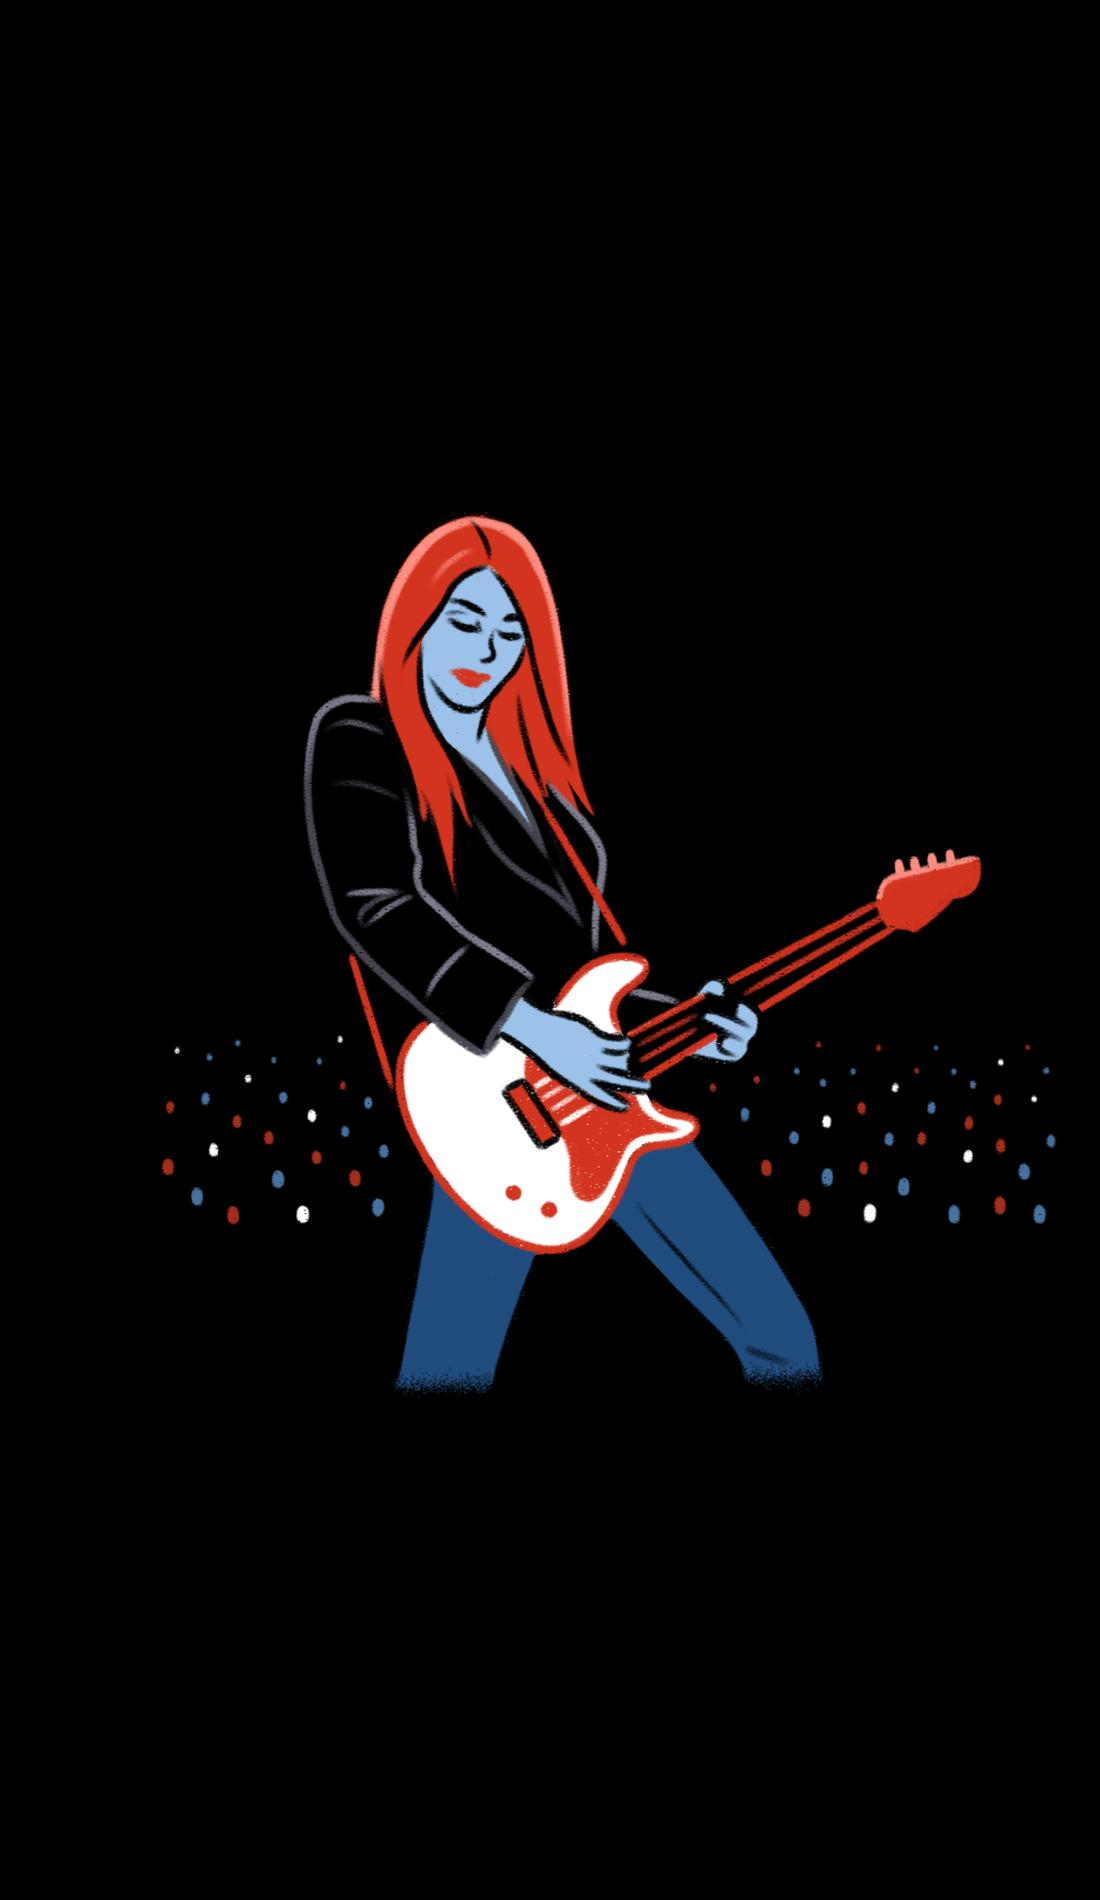 A DJ Shift live event